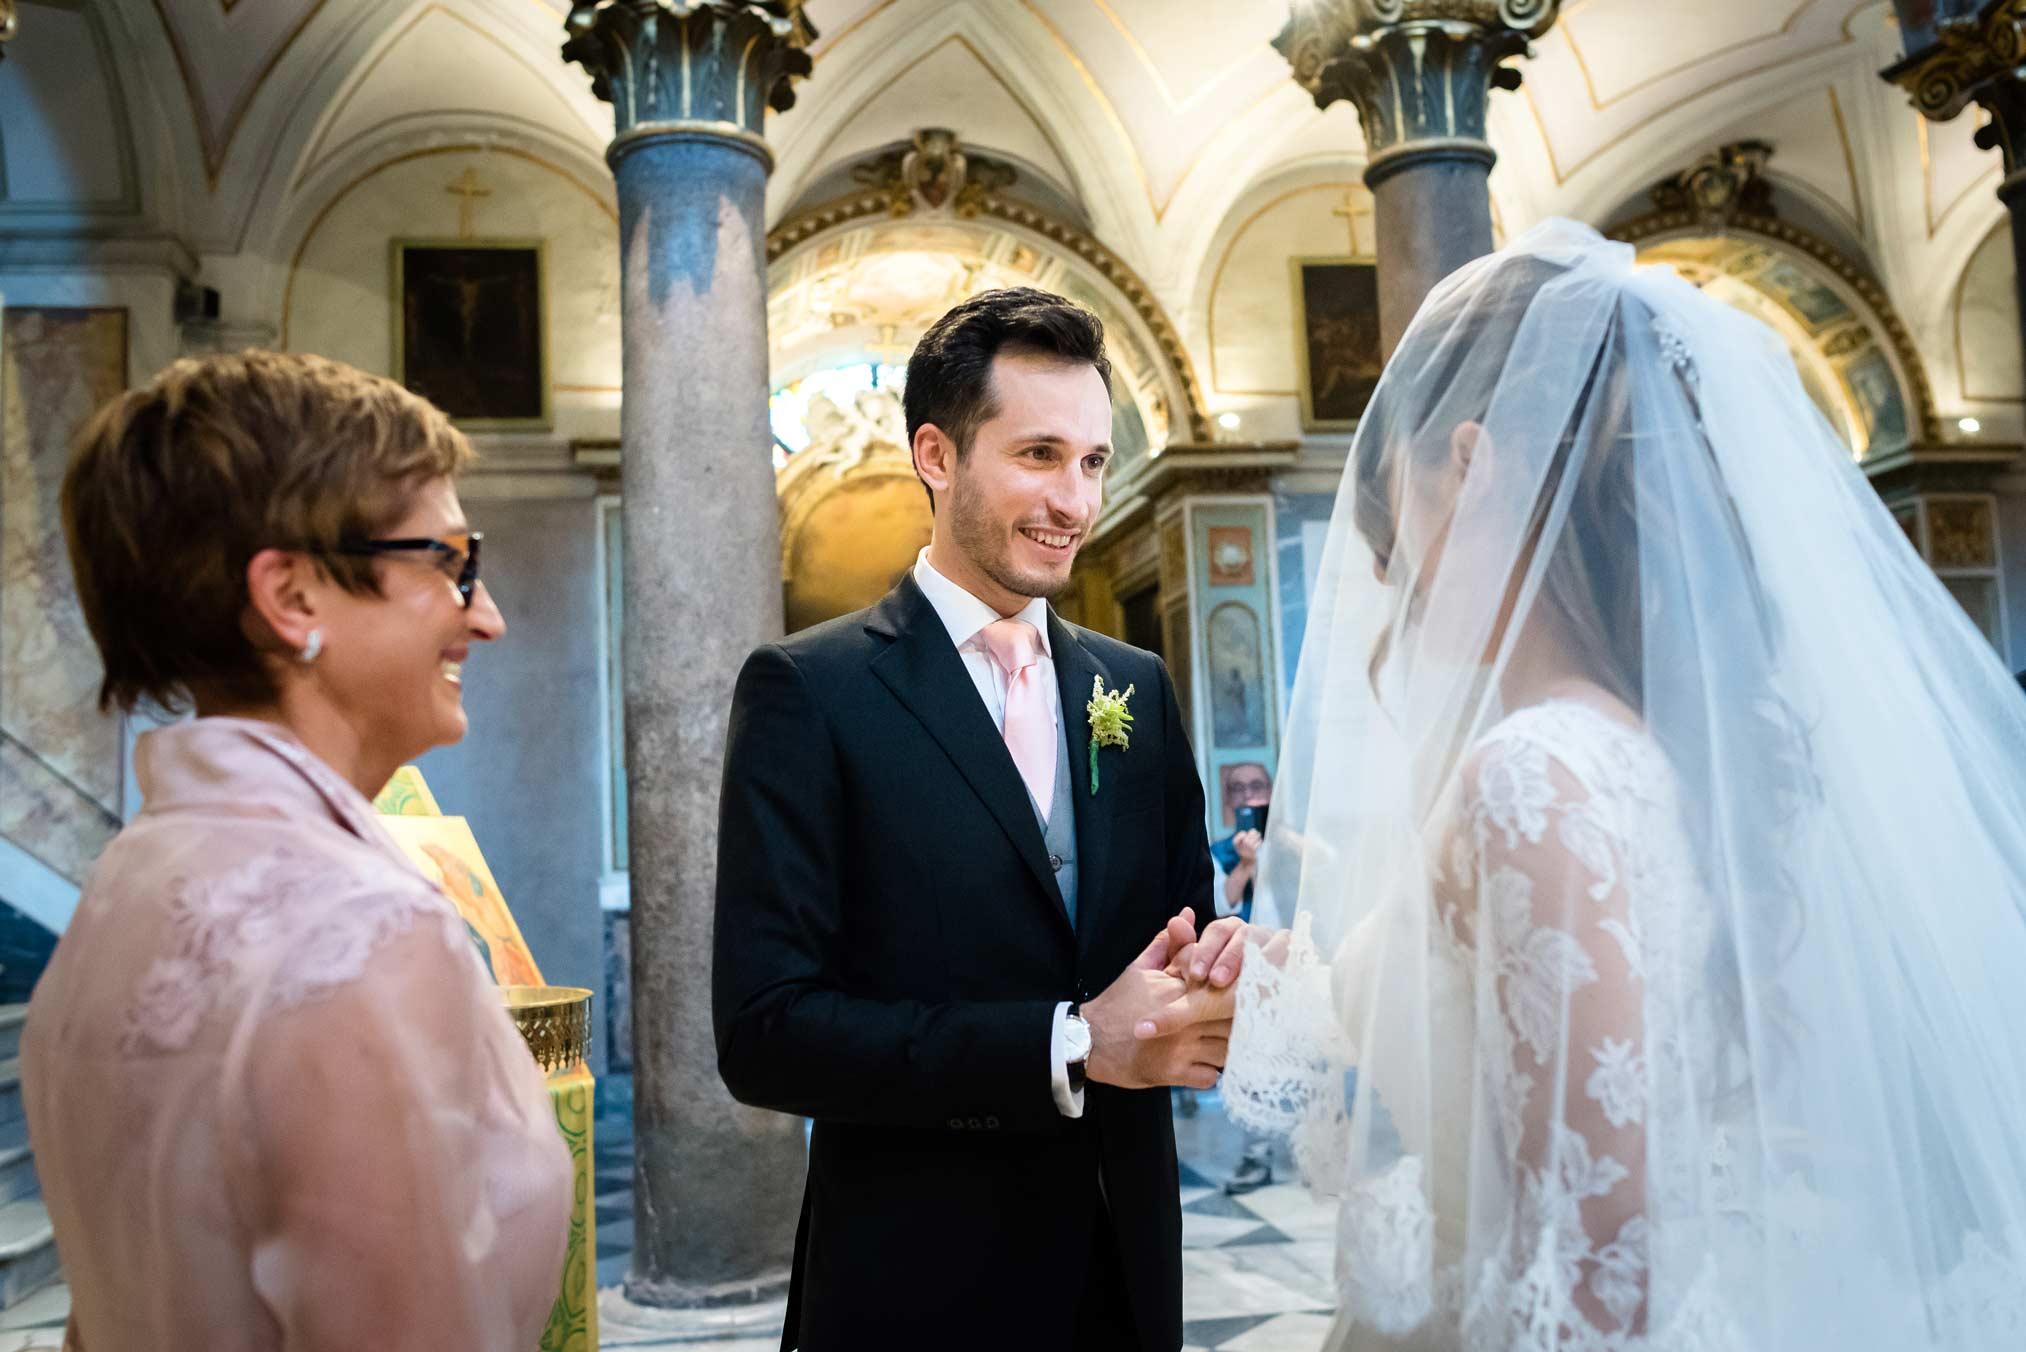 Fotografo-Per-Matrimonio-Roma-Reportage-Cerimonia-1